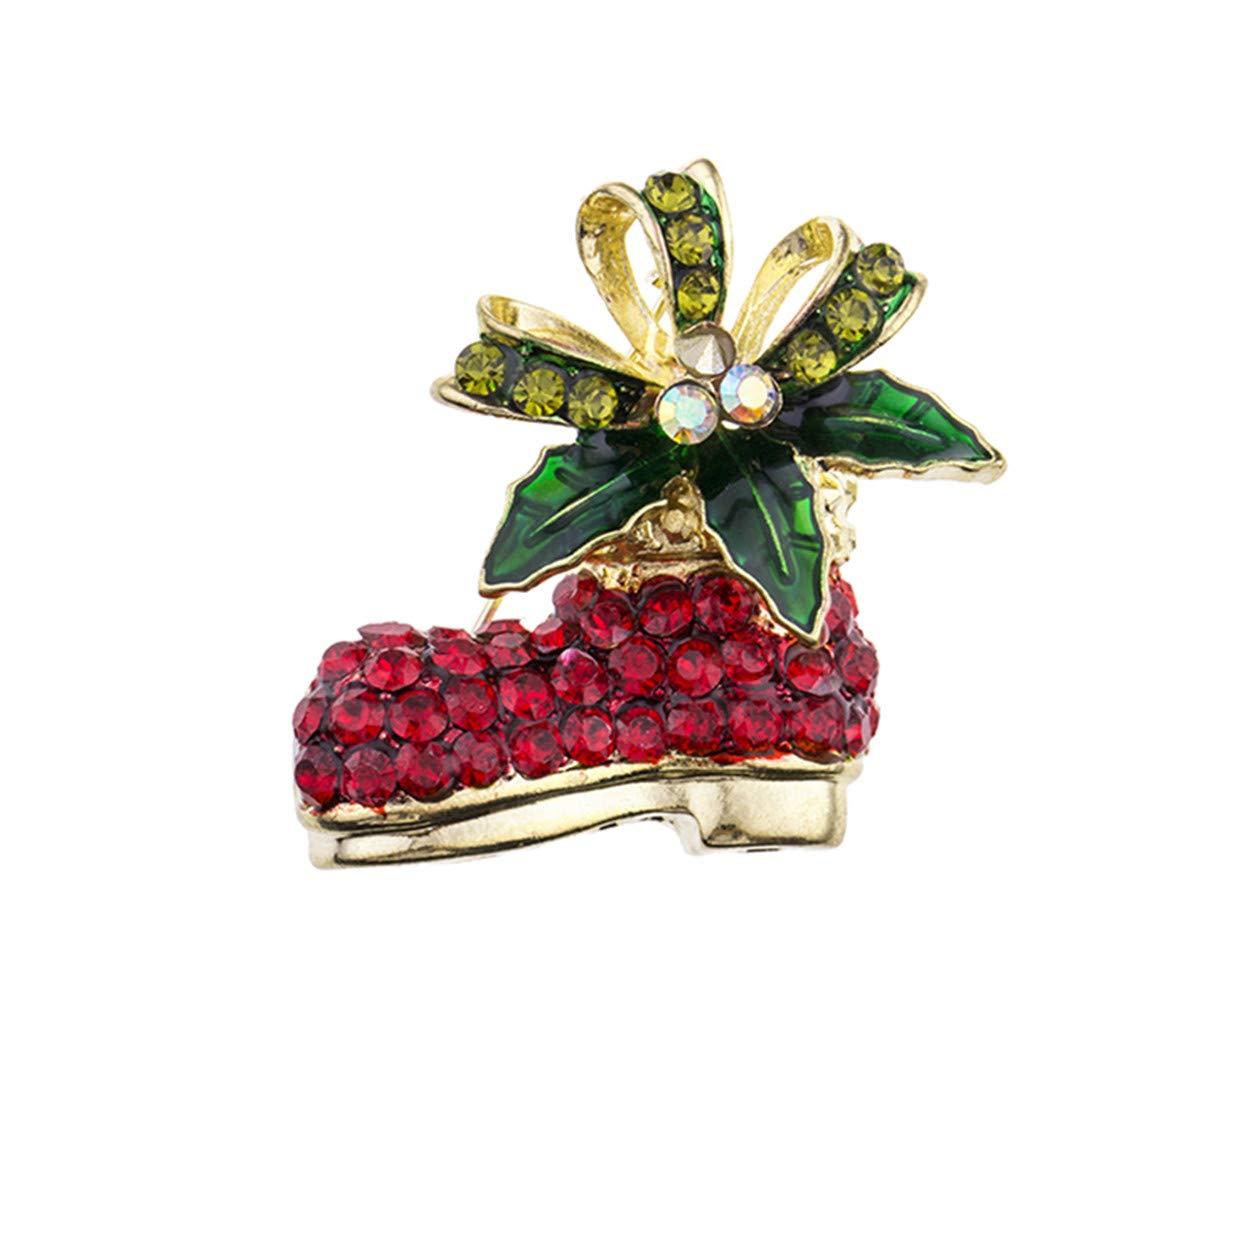 LALANG Christmas Boots Brooch Pin Clothing Bag Accessories